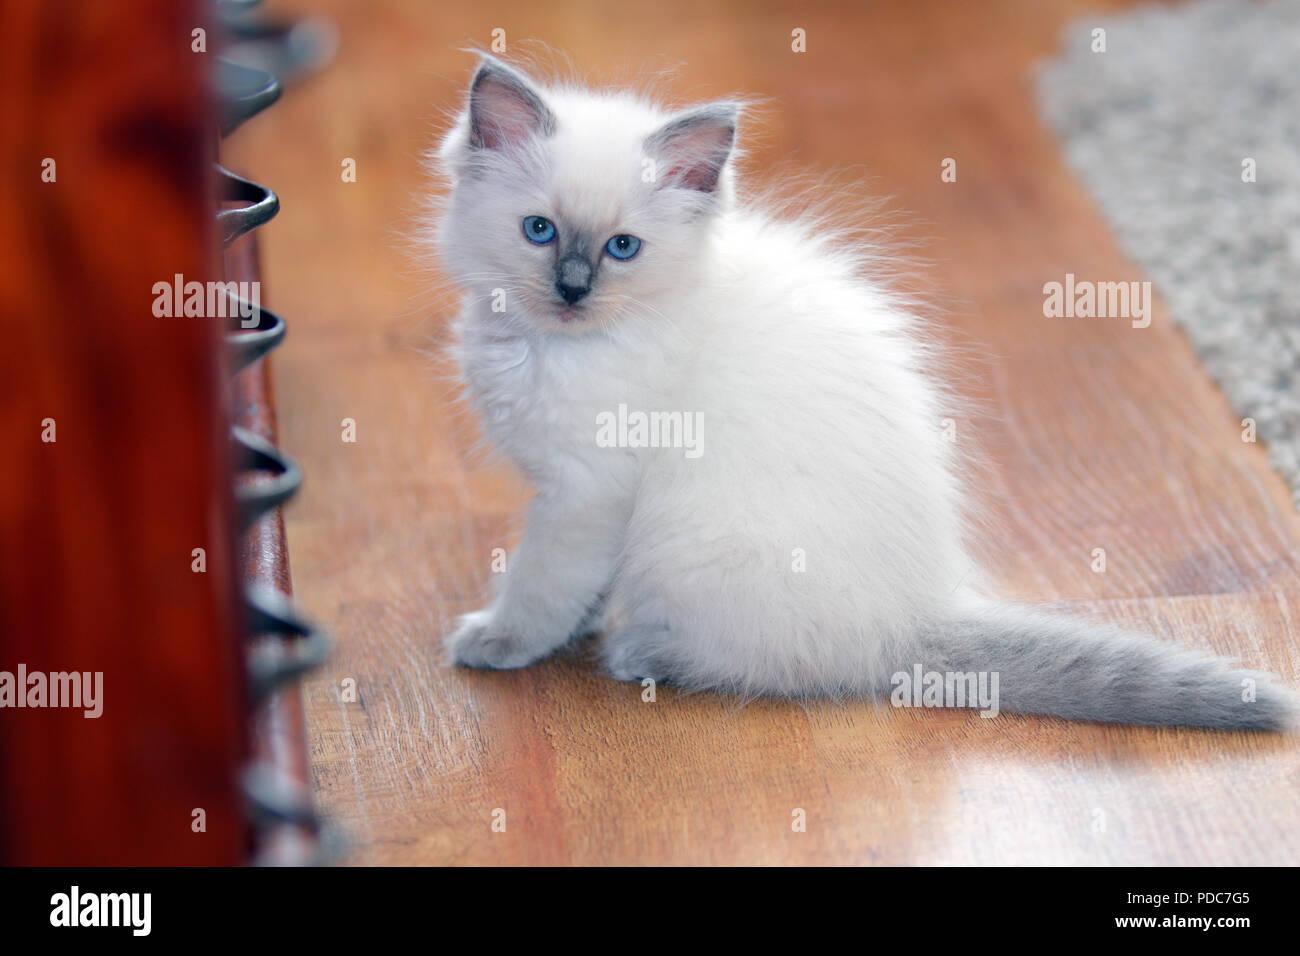 Cute Ragdoll Kitten Stock Photos & Cute Ragdoll Kitten Stock